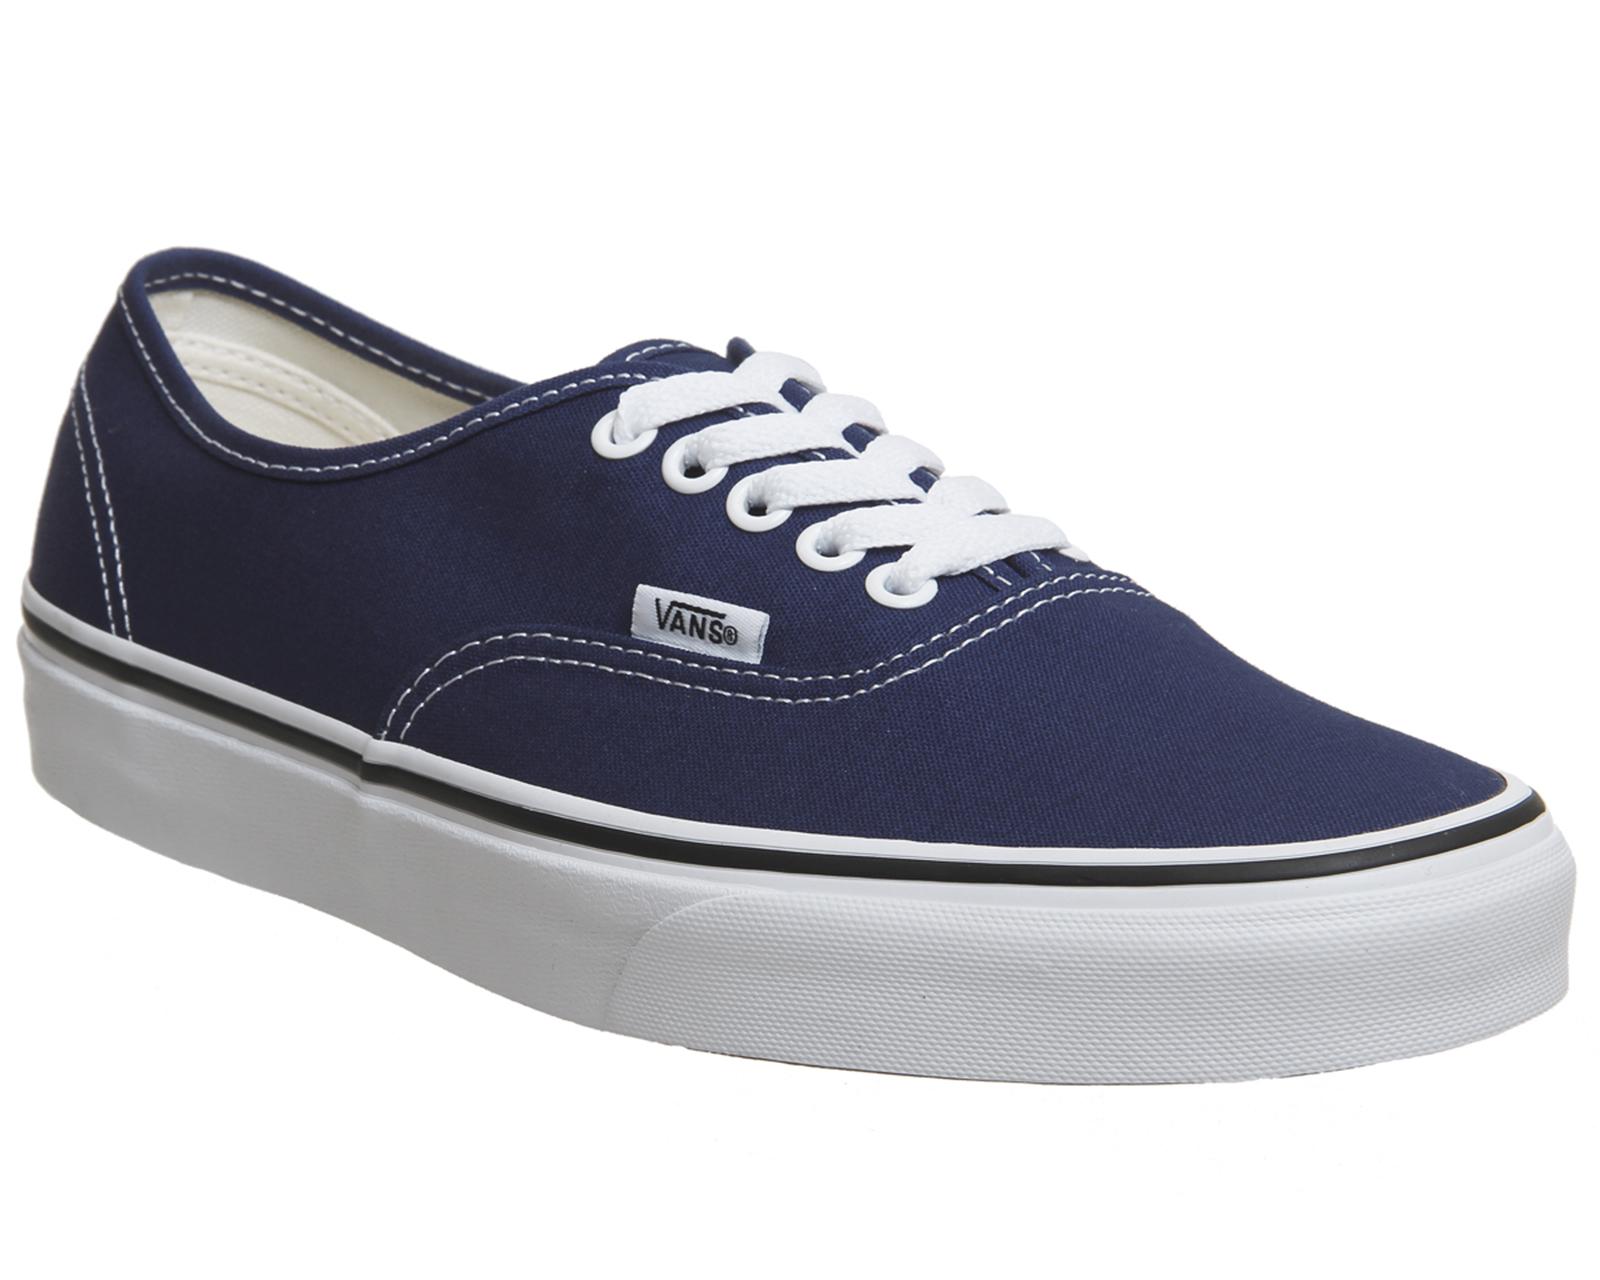 Hombre Vans Authentic Trainers ESTATE Azul TRUE Blanco Blanco TRUE Trainers Zapatos 245fa8